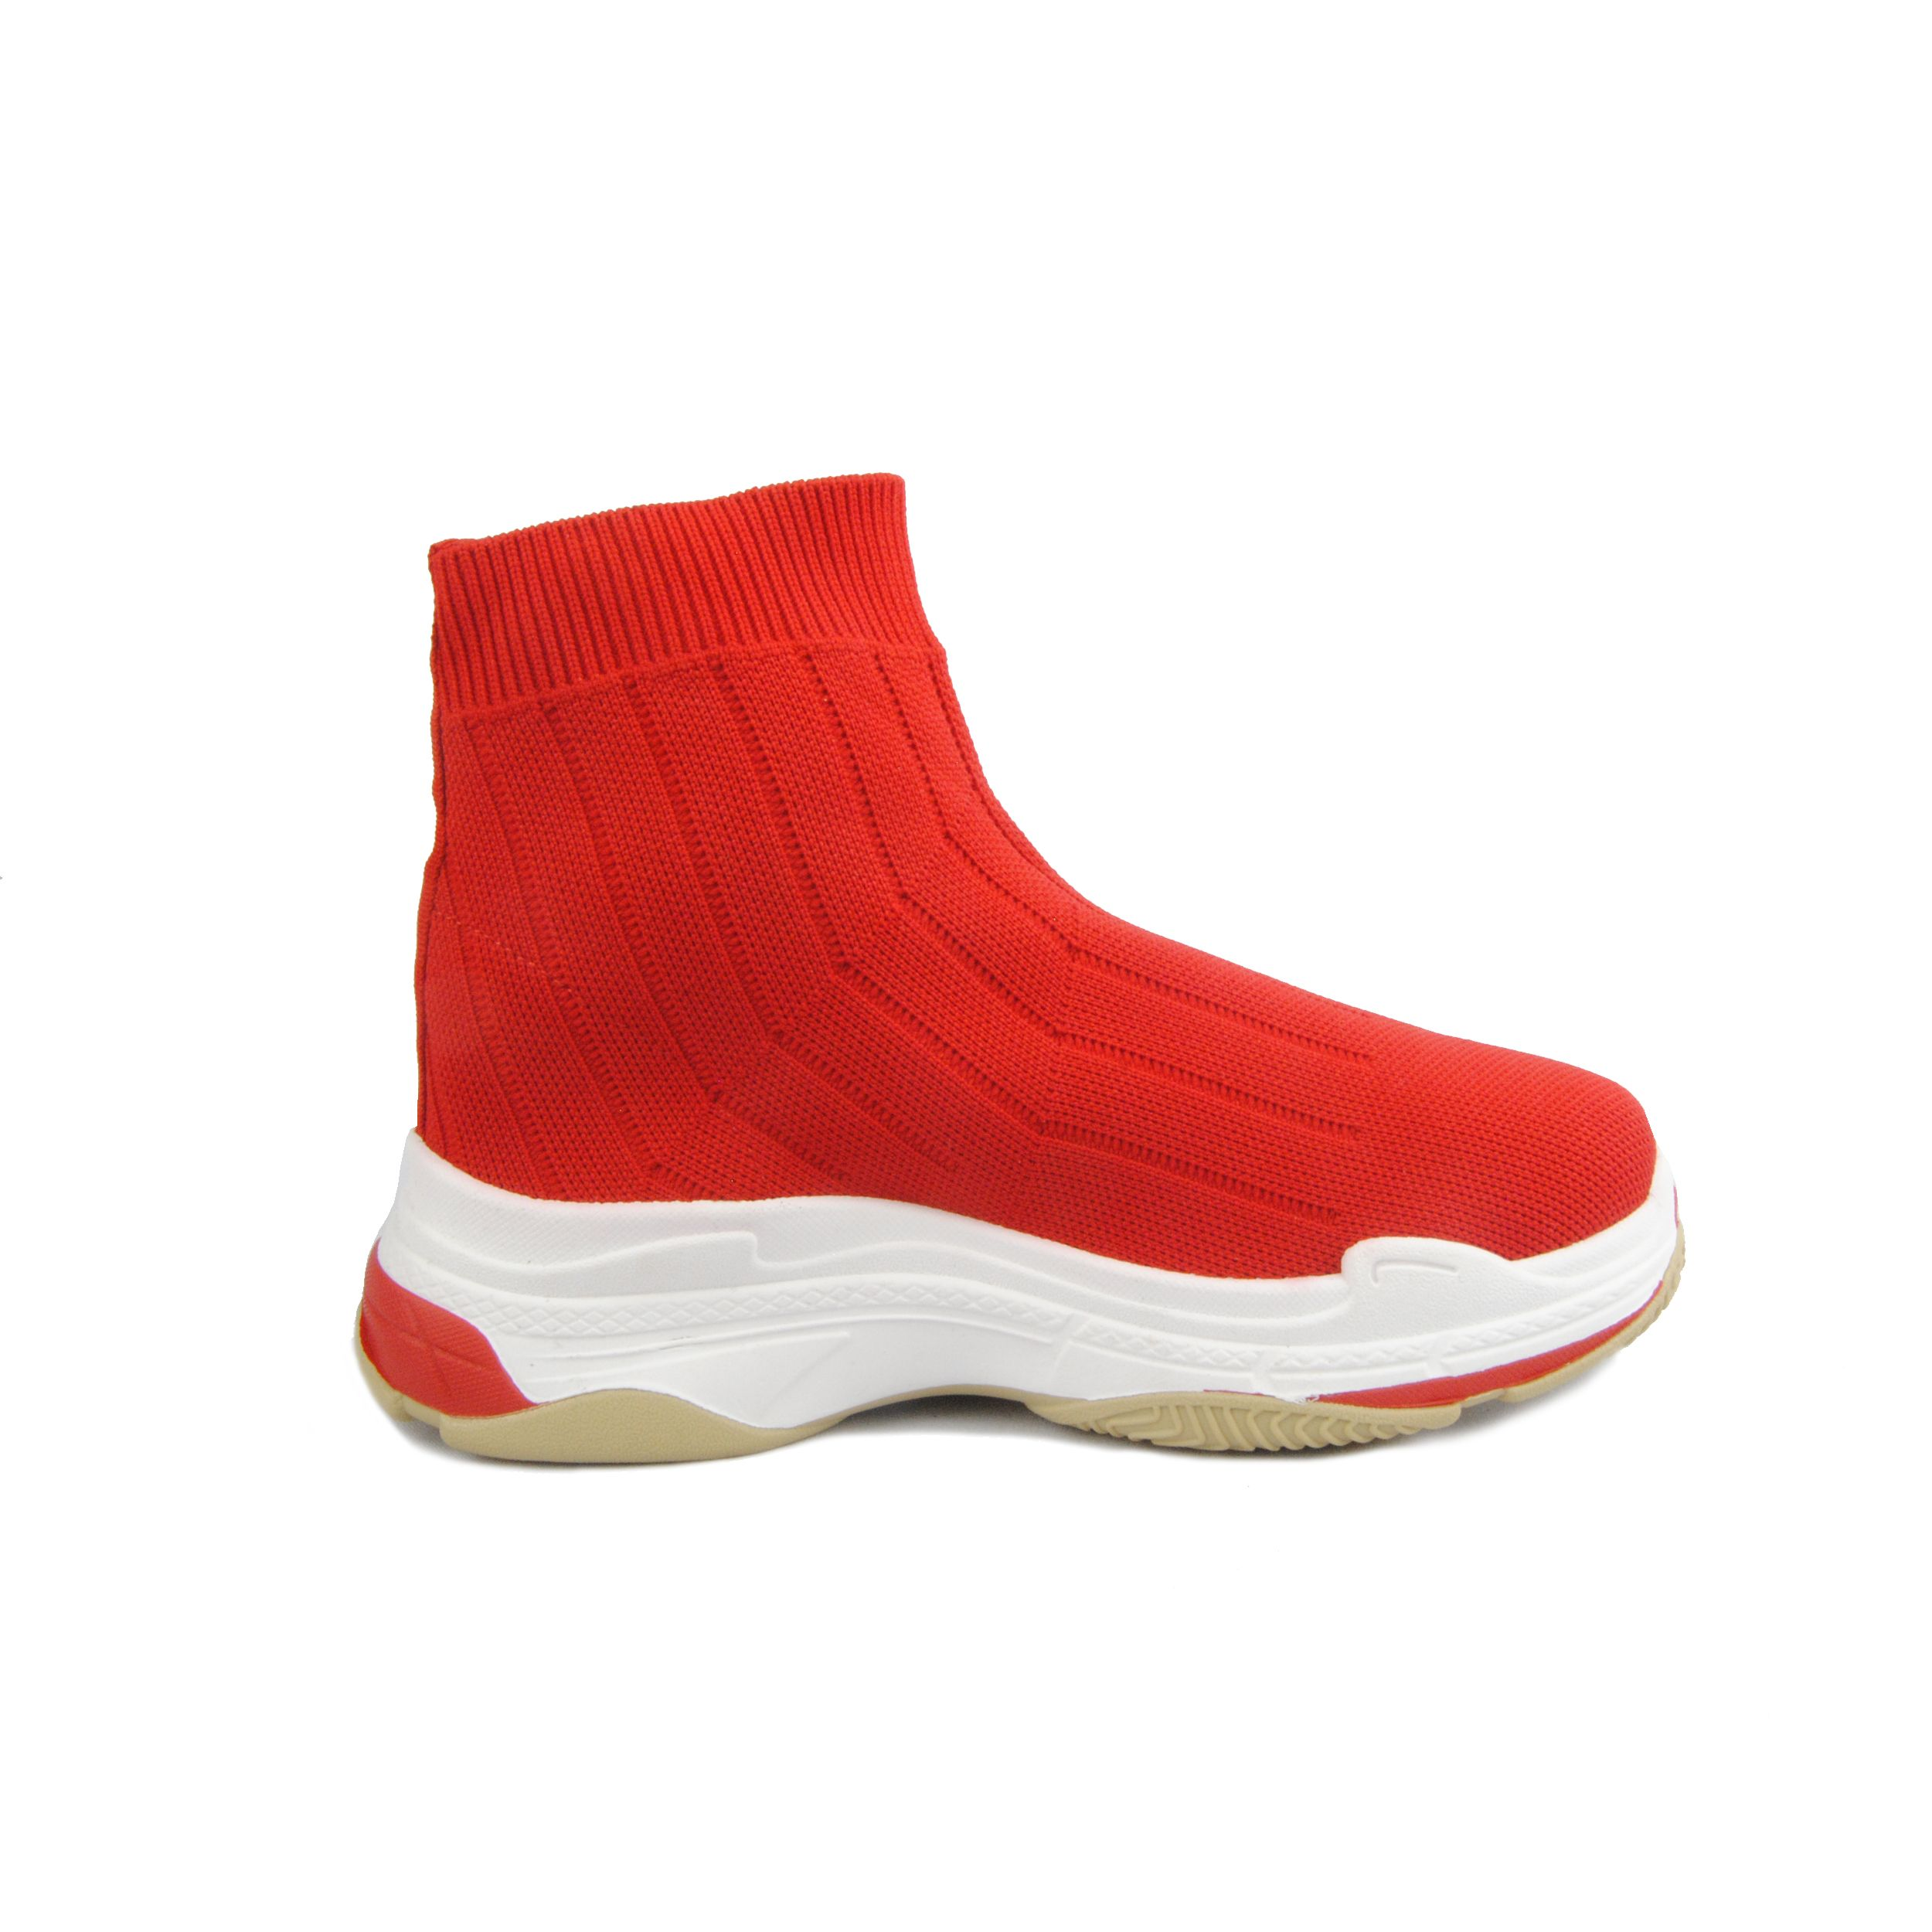 Montevita Chunky Sneaker Boot in Red